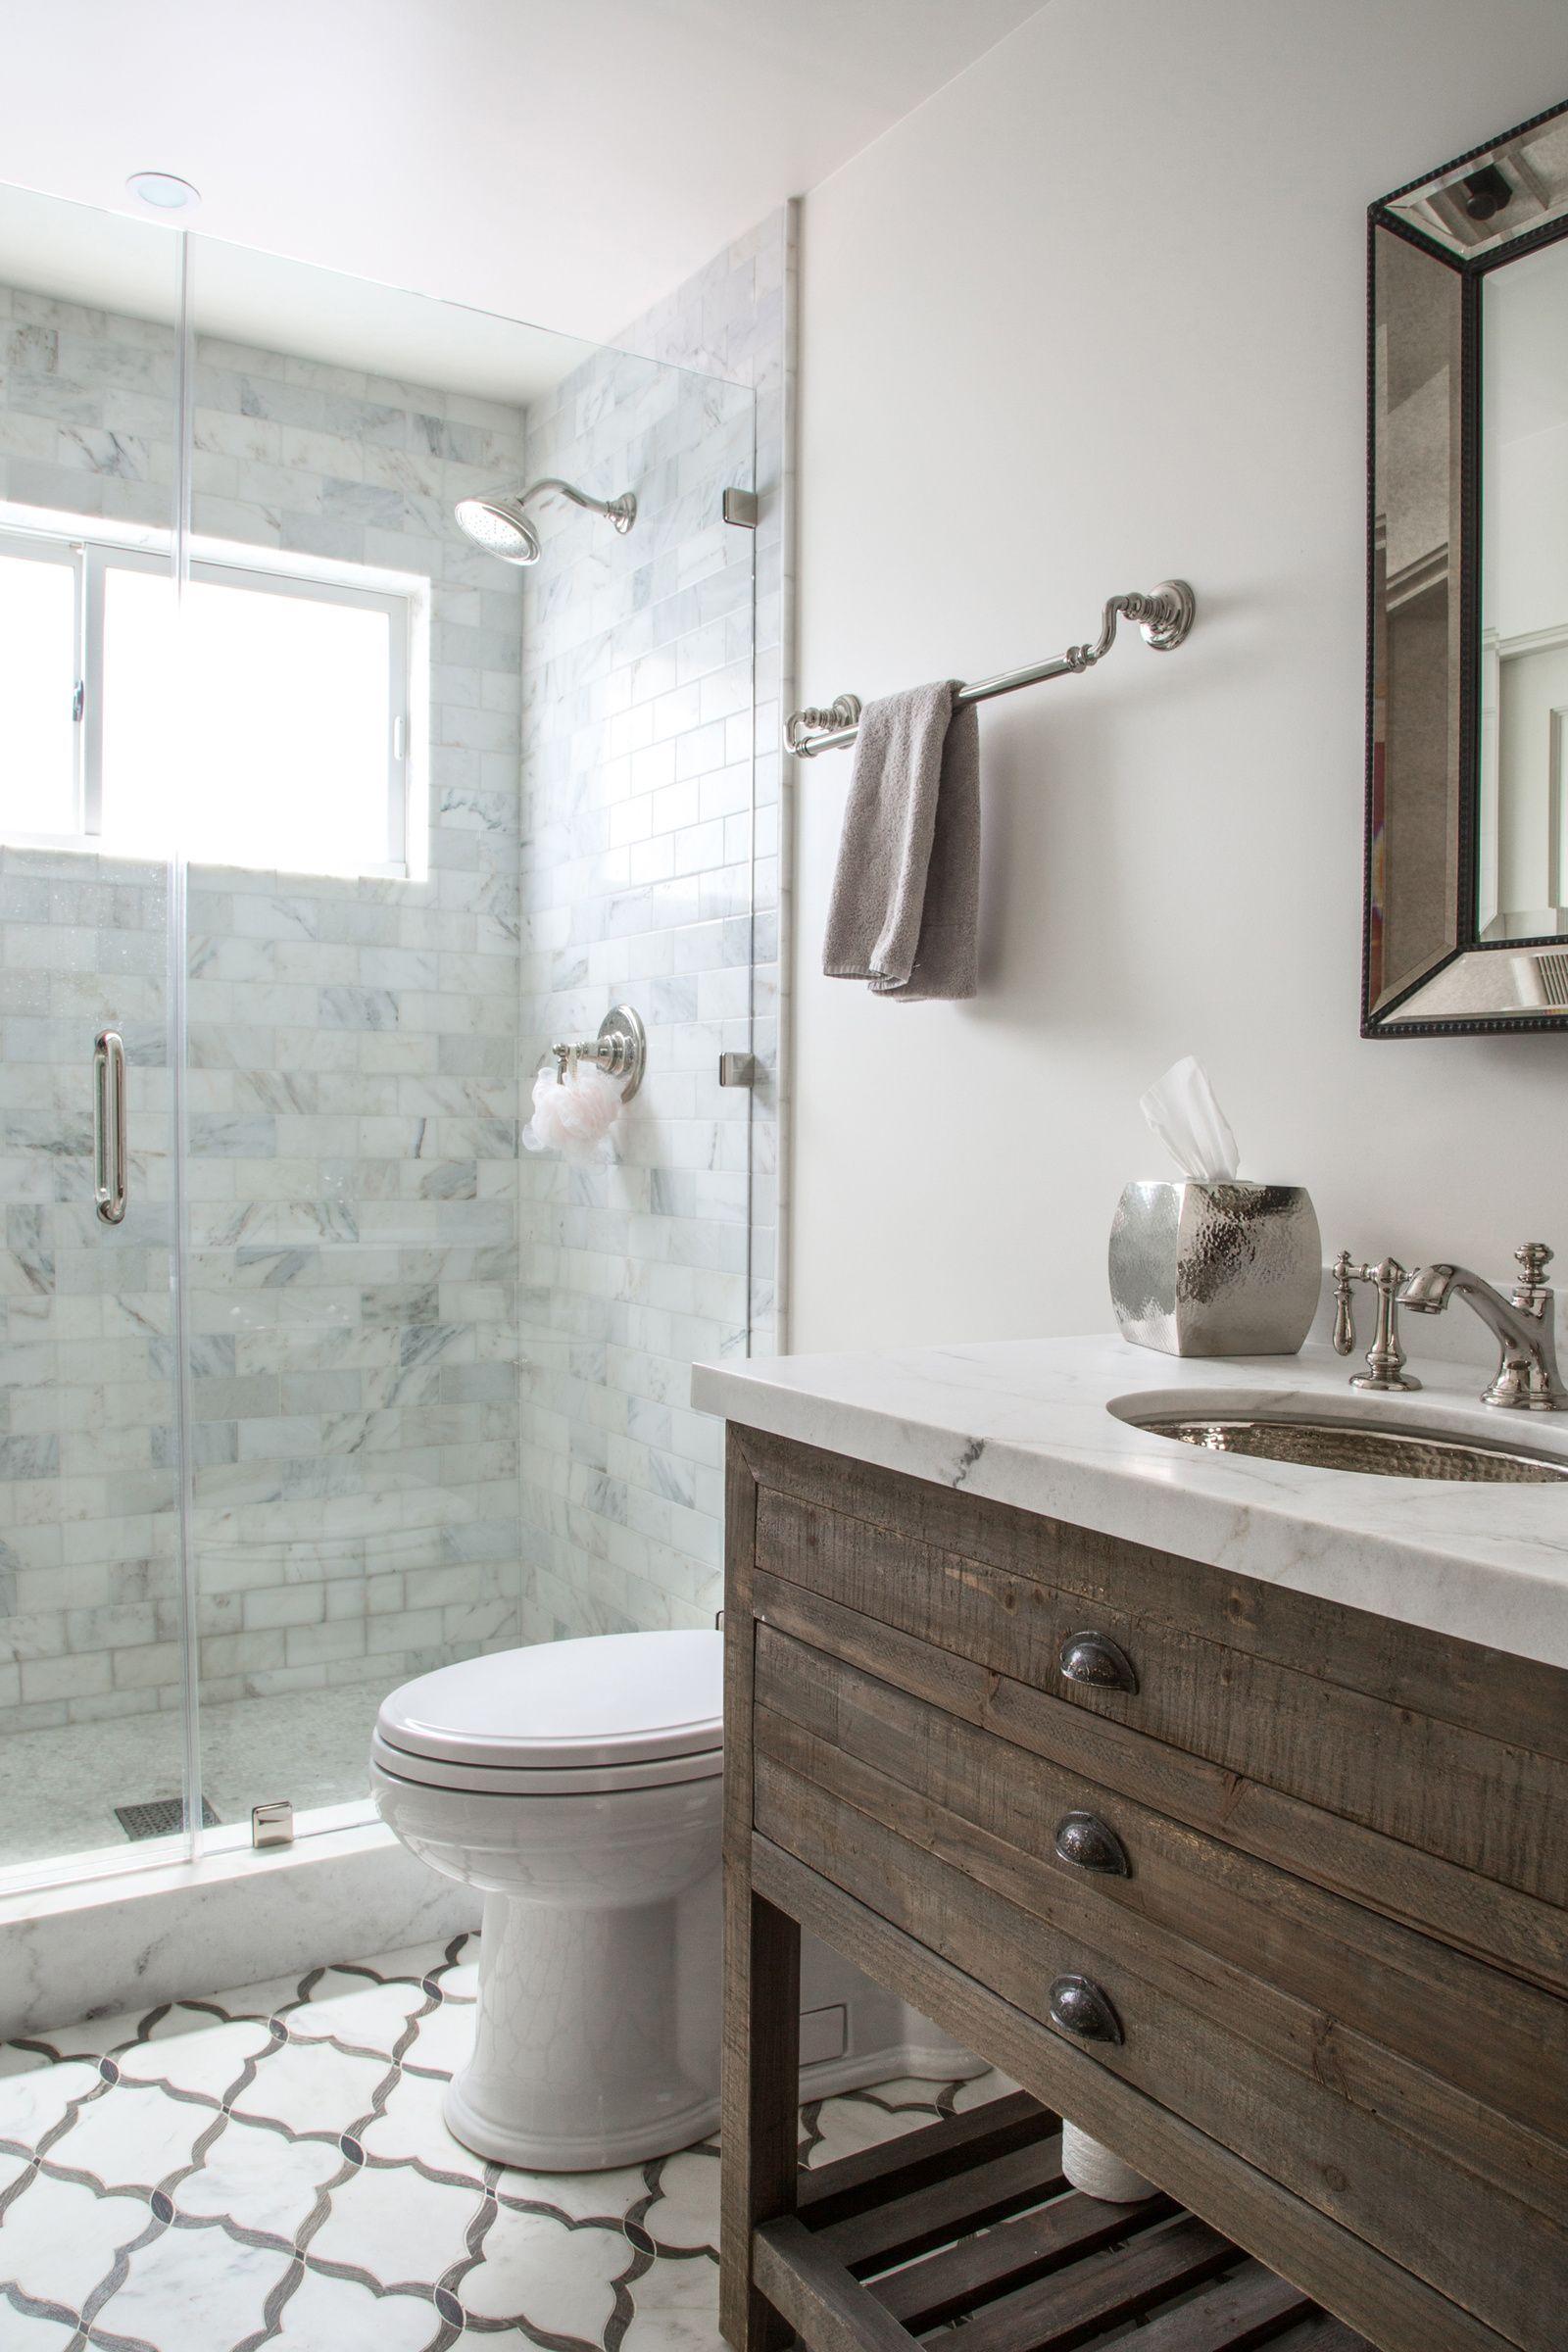 40 Beige Bathroom Tiles Ideas And Pictures Transitional Bathroom Design Bathroom Design Small Small Bathroom Remodel